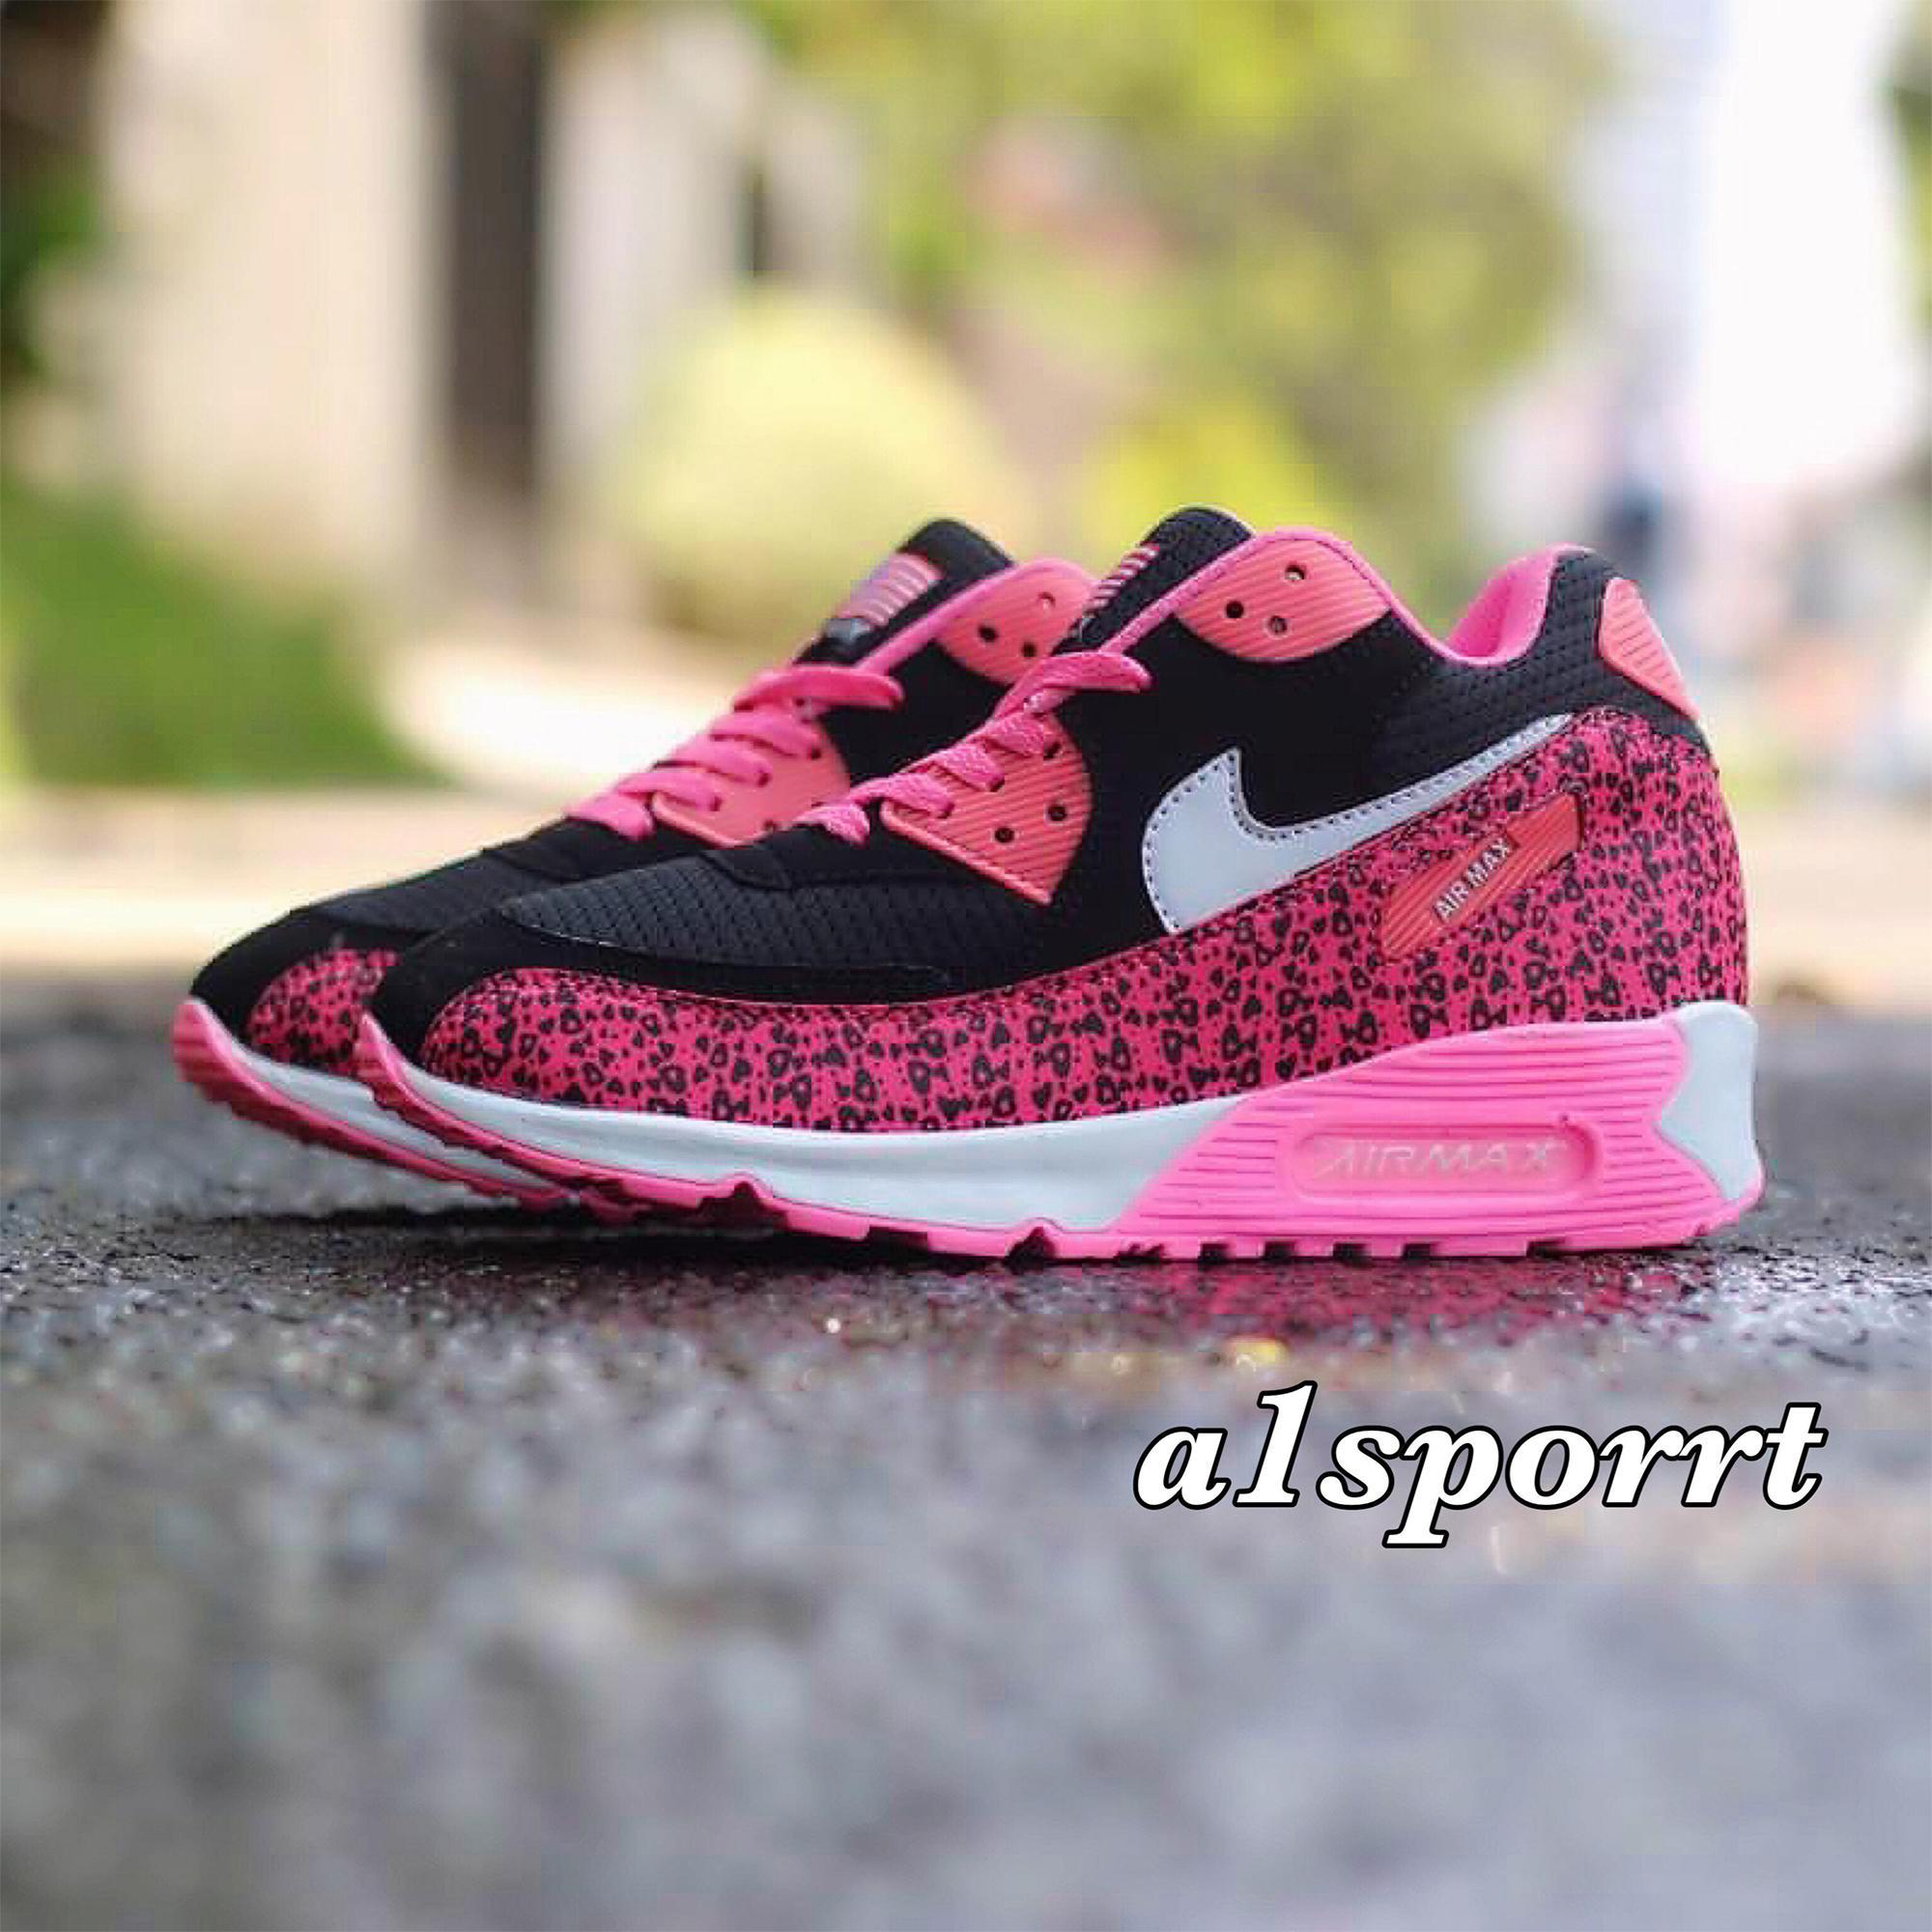 Nike Airmax Kualitas Premium Hitam Pink Corak